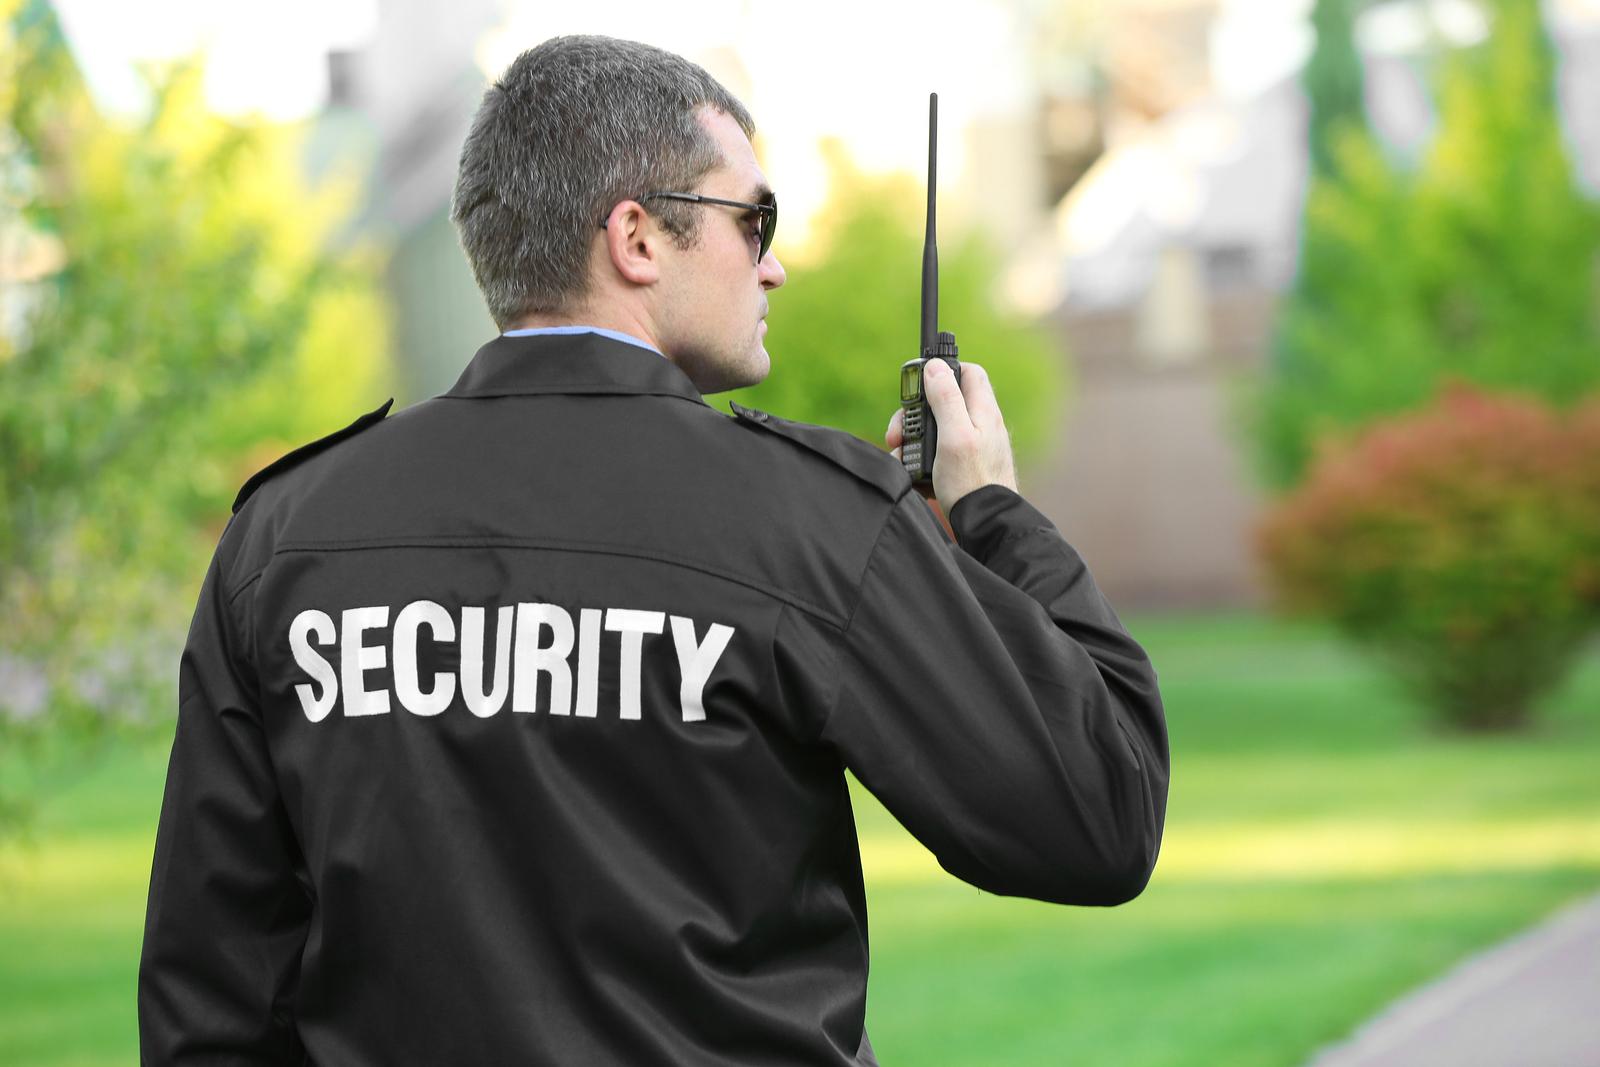 bigstock-Male-security-guard-in-park-158811245